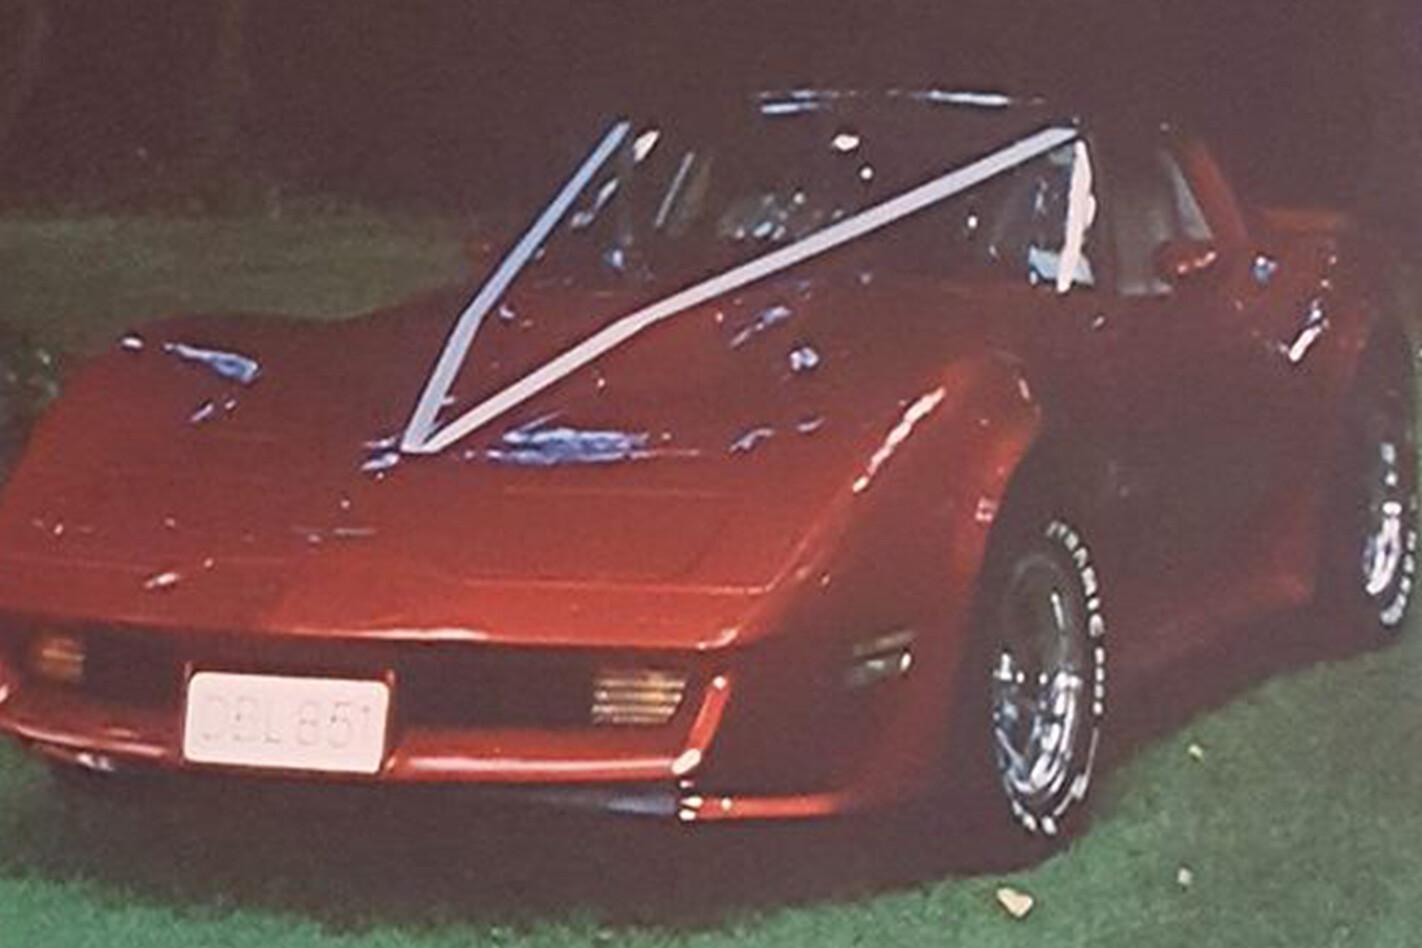 Graham Espiner's wedding car